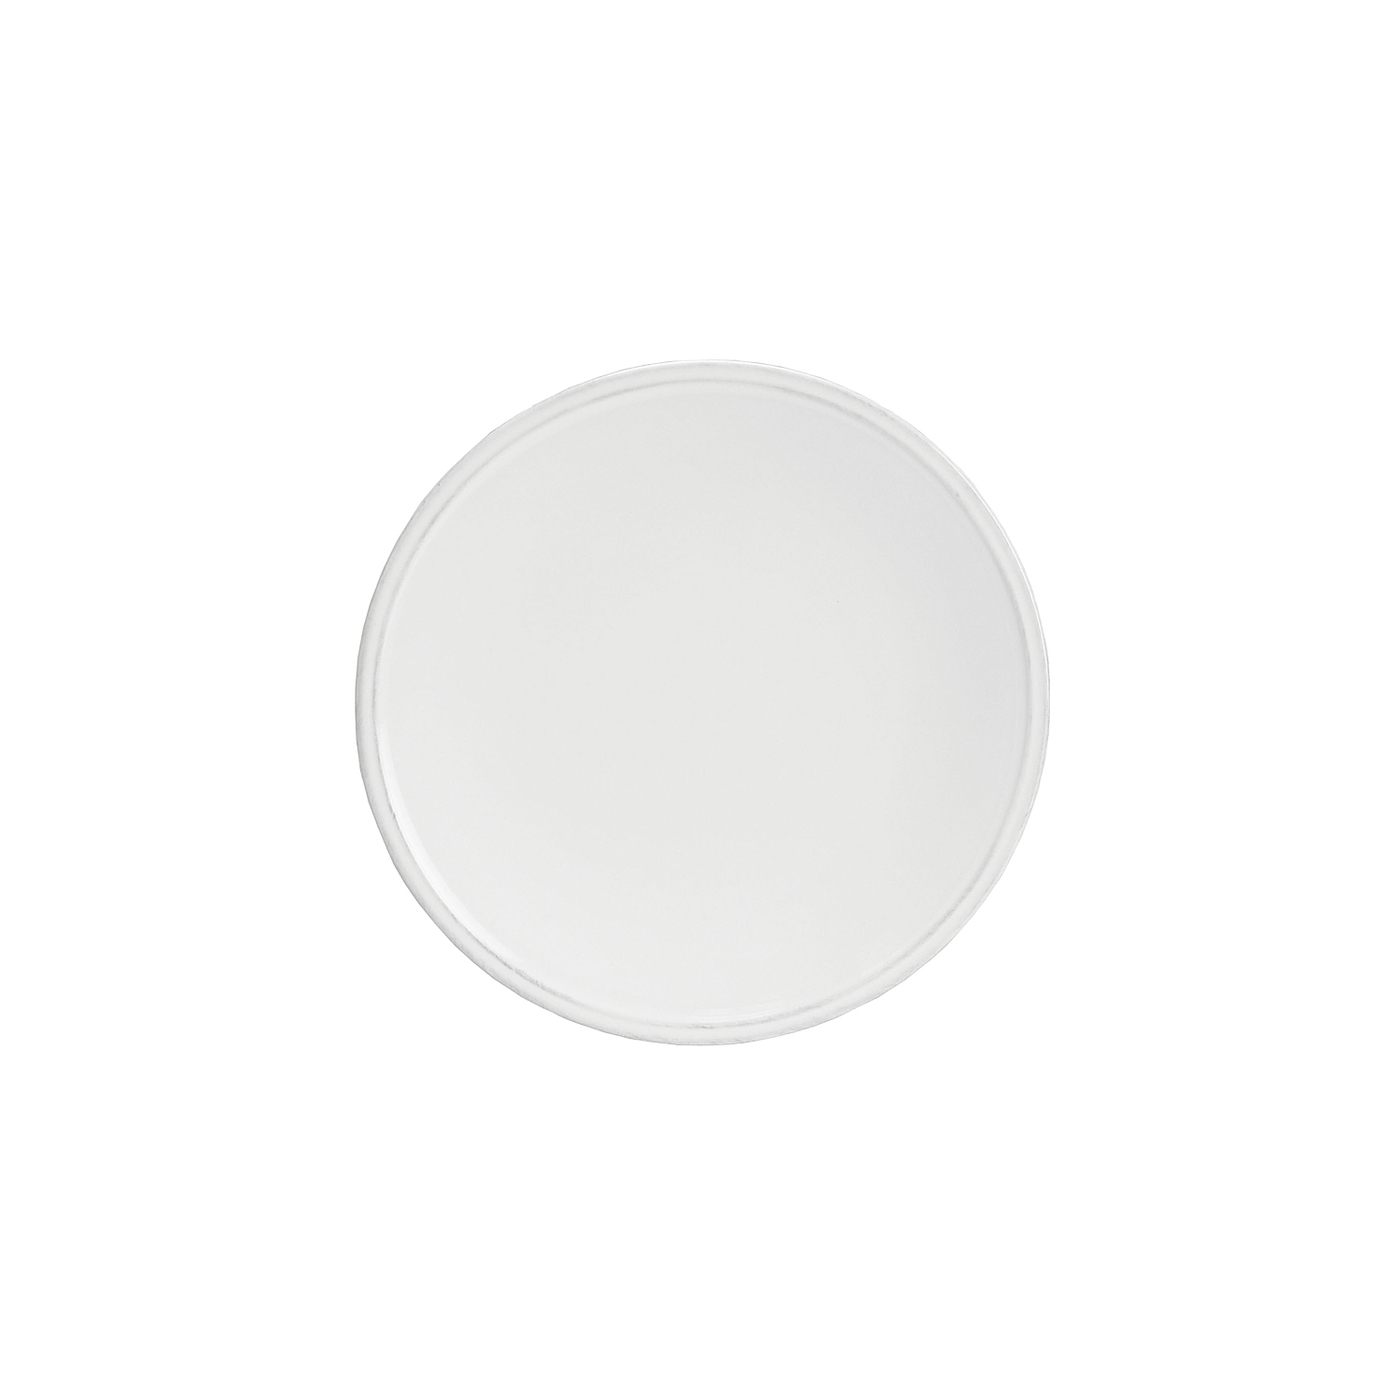 Costa Nova Friso White 8.75 Inch Salad Plate, Set of 6